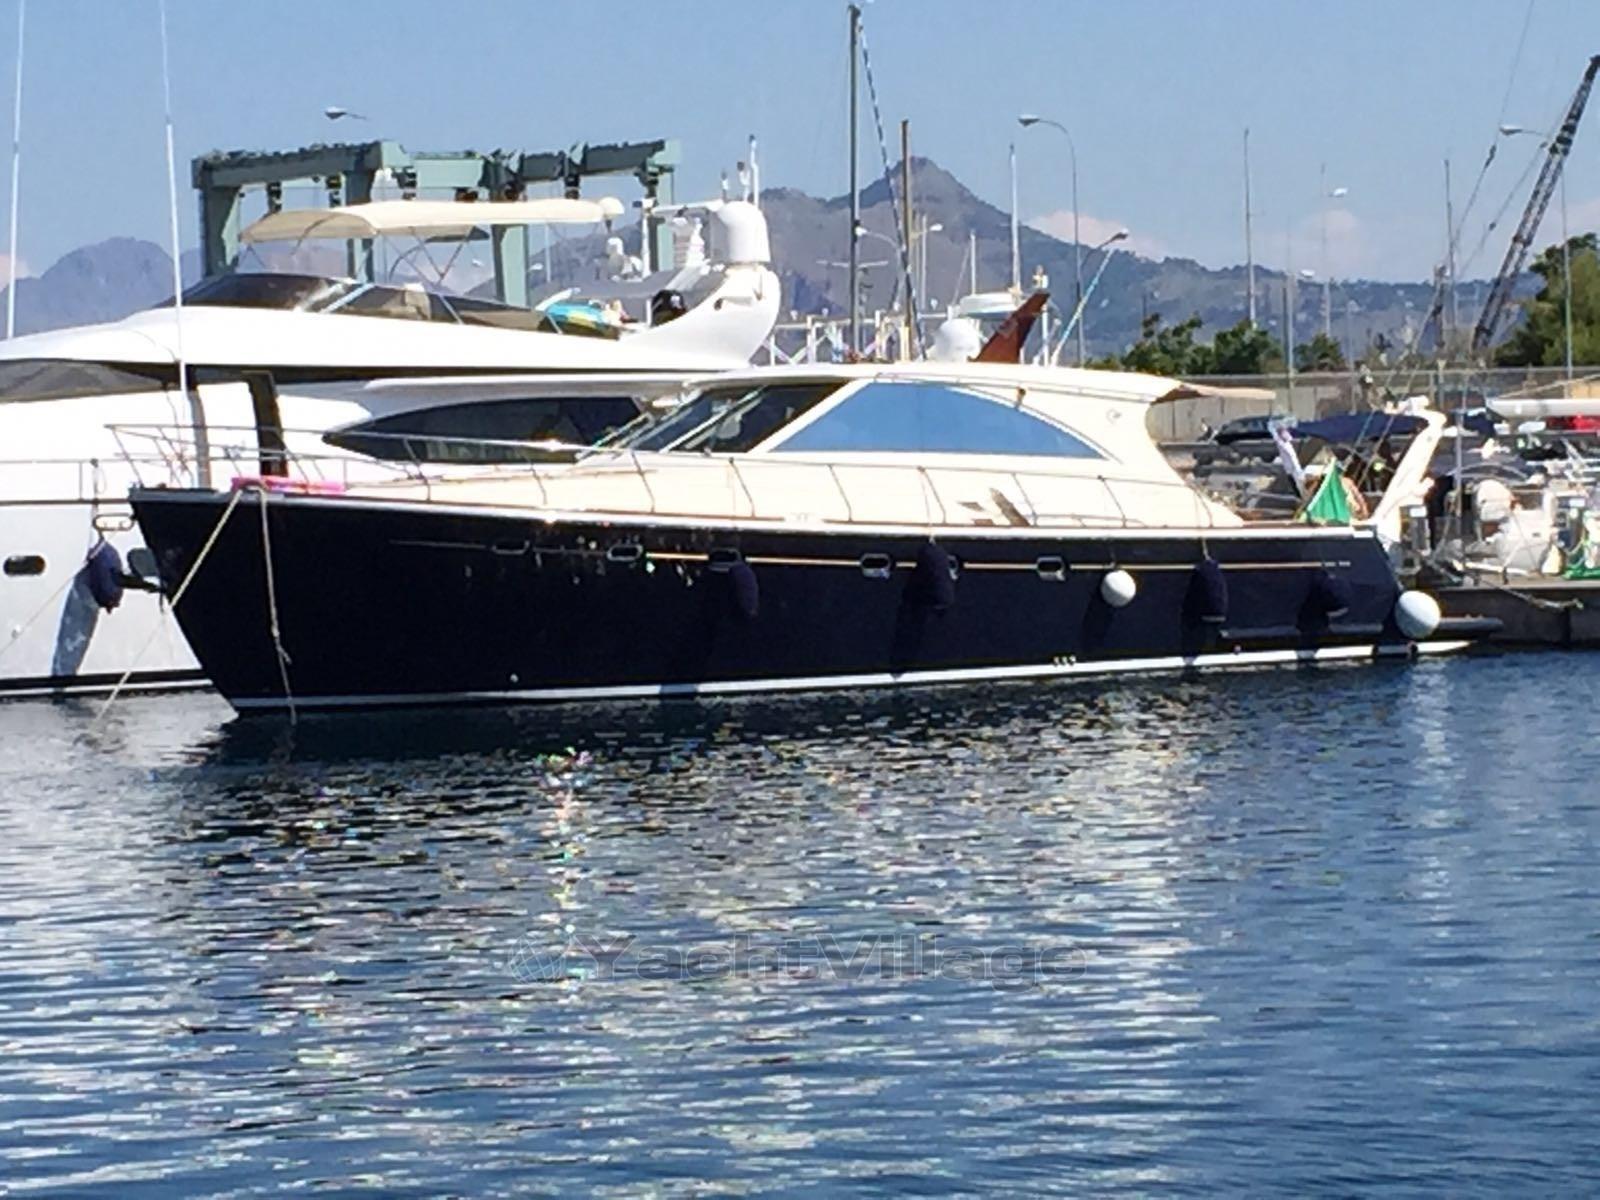 bateau_cantieri-estensi-goldstar-540-s_4088165.jpg